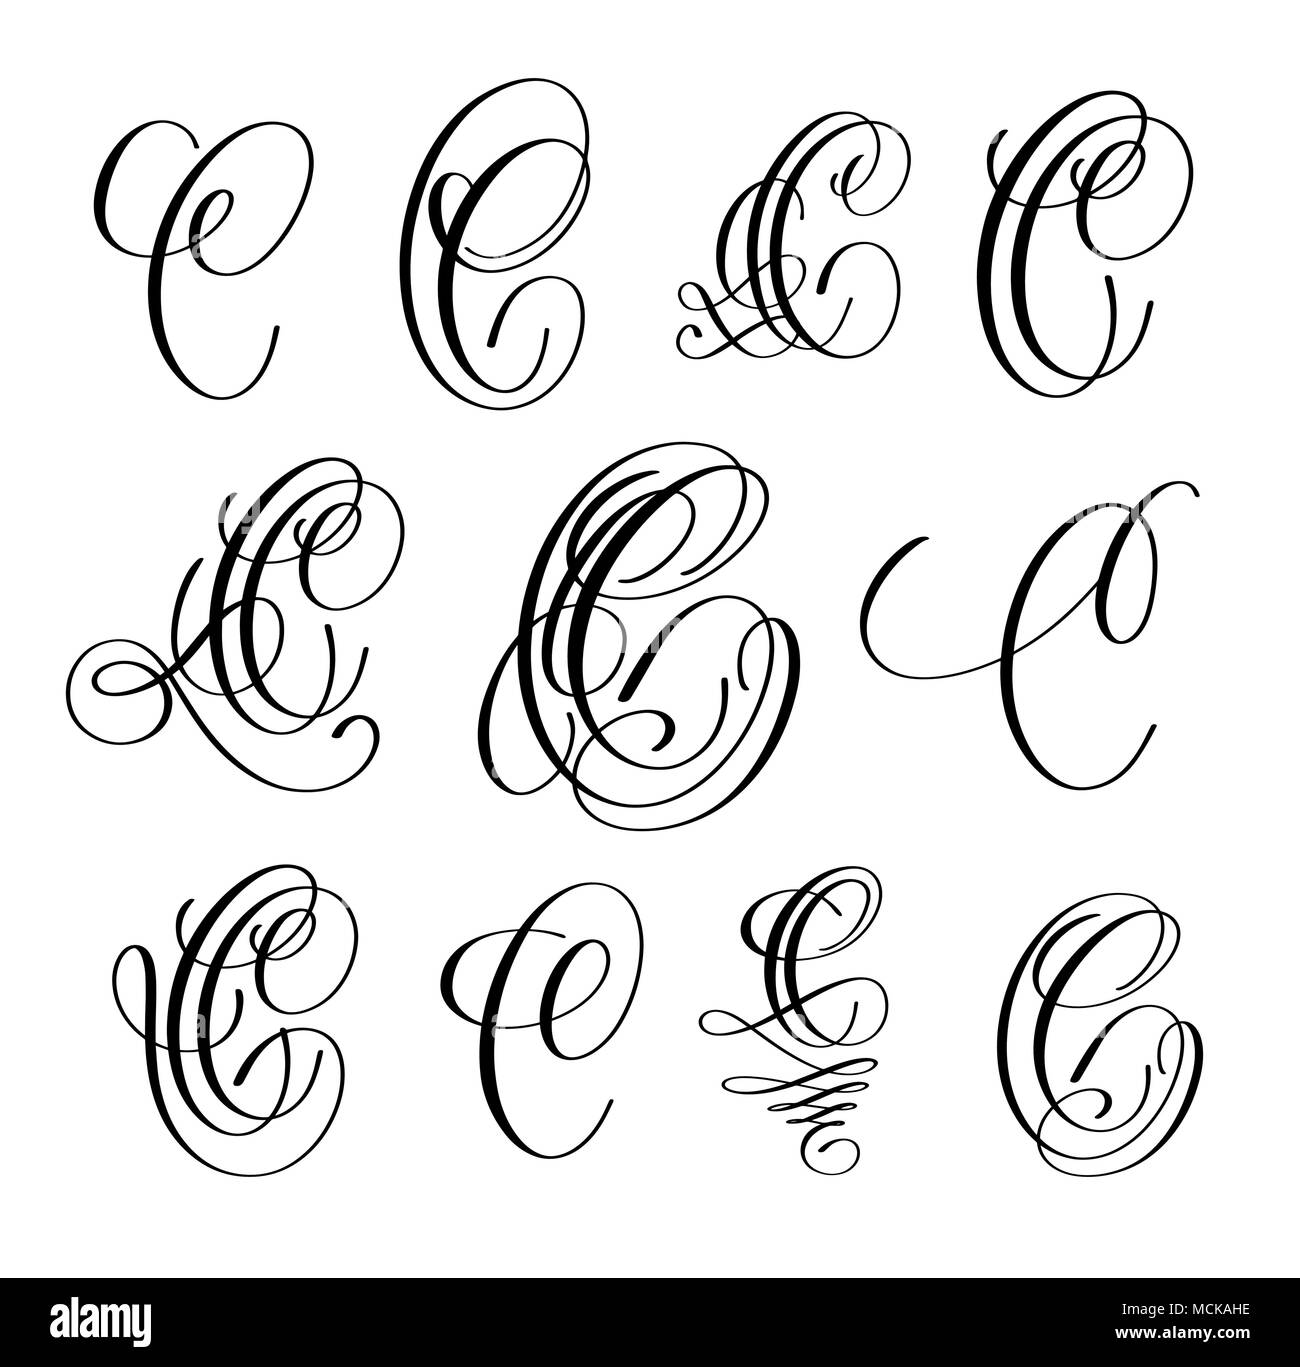 Calligraphy Lettering Script Font C Set Hand Written Signature